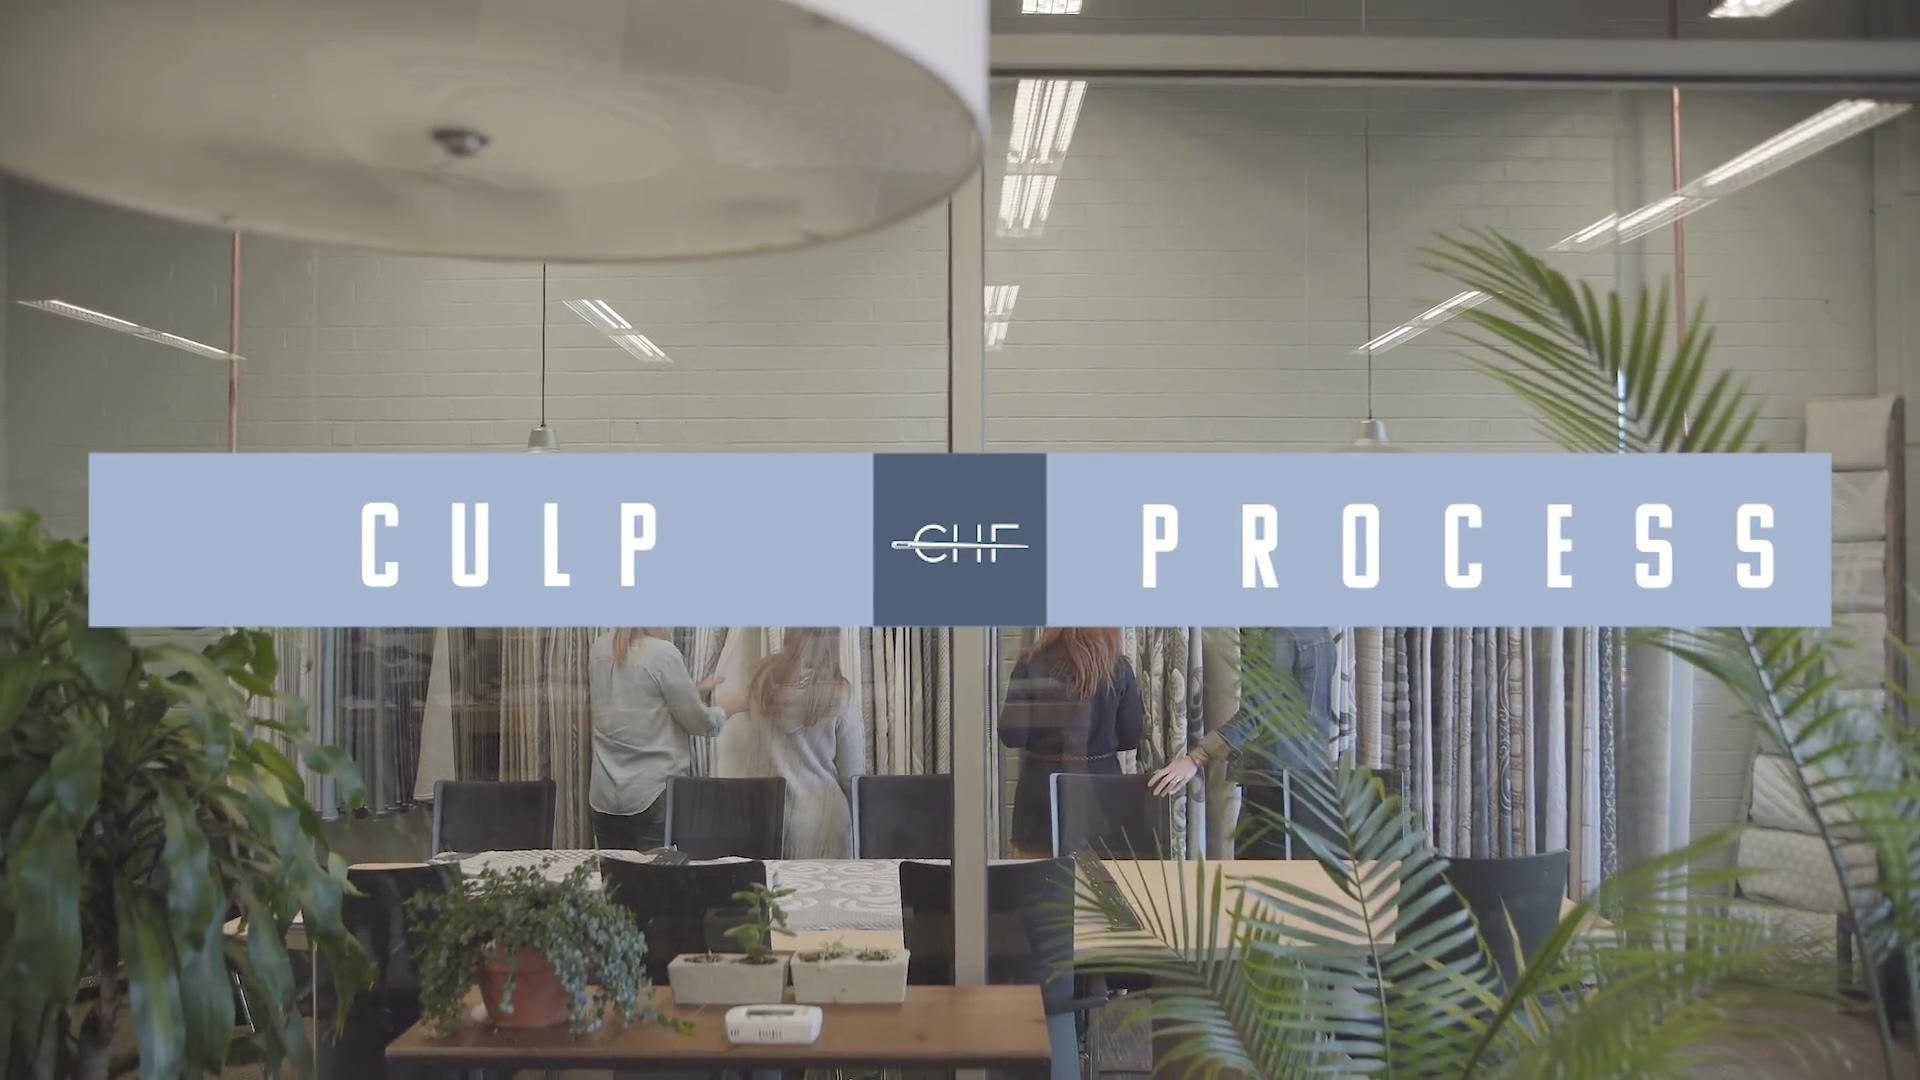 CULP_CHF_PROCESS_FB